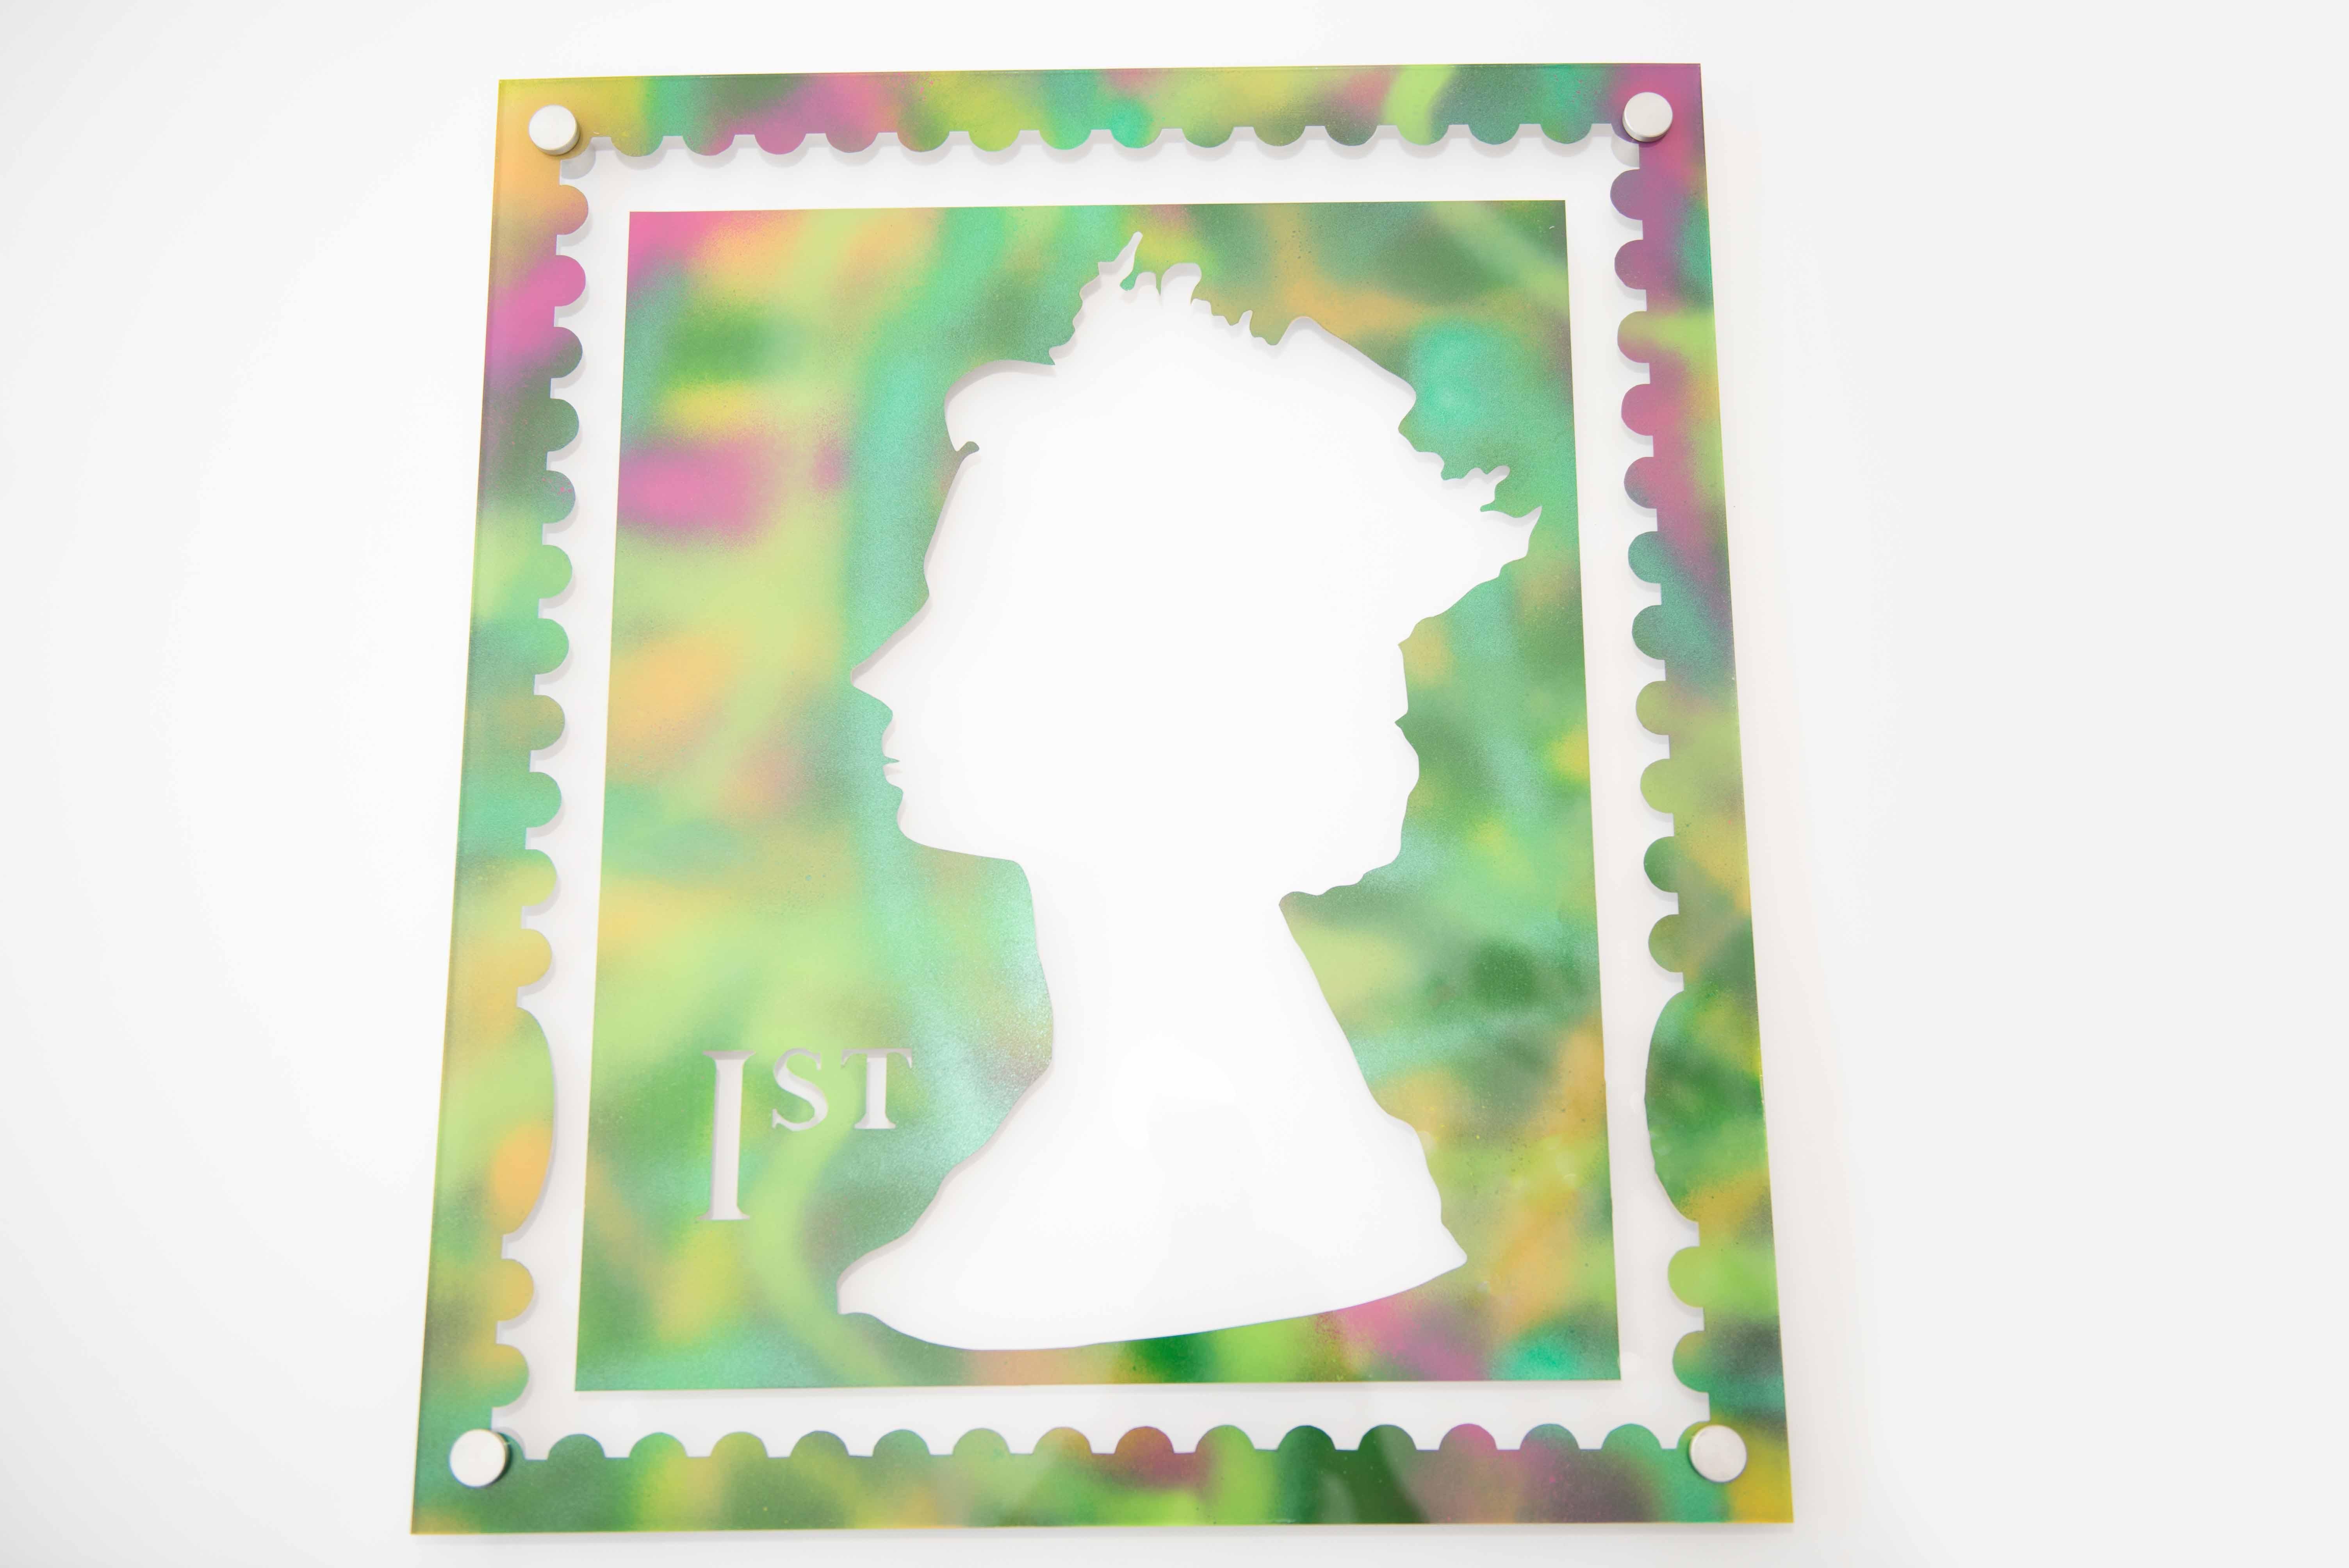 Post Stamp 1